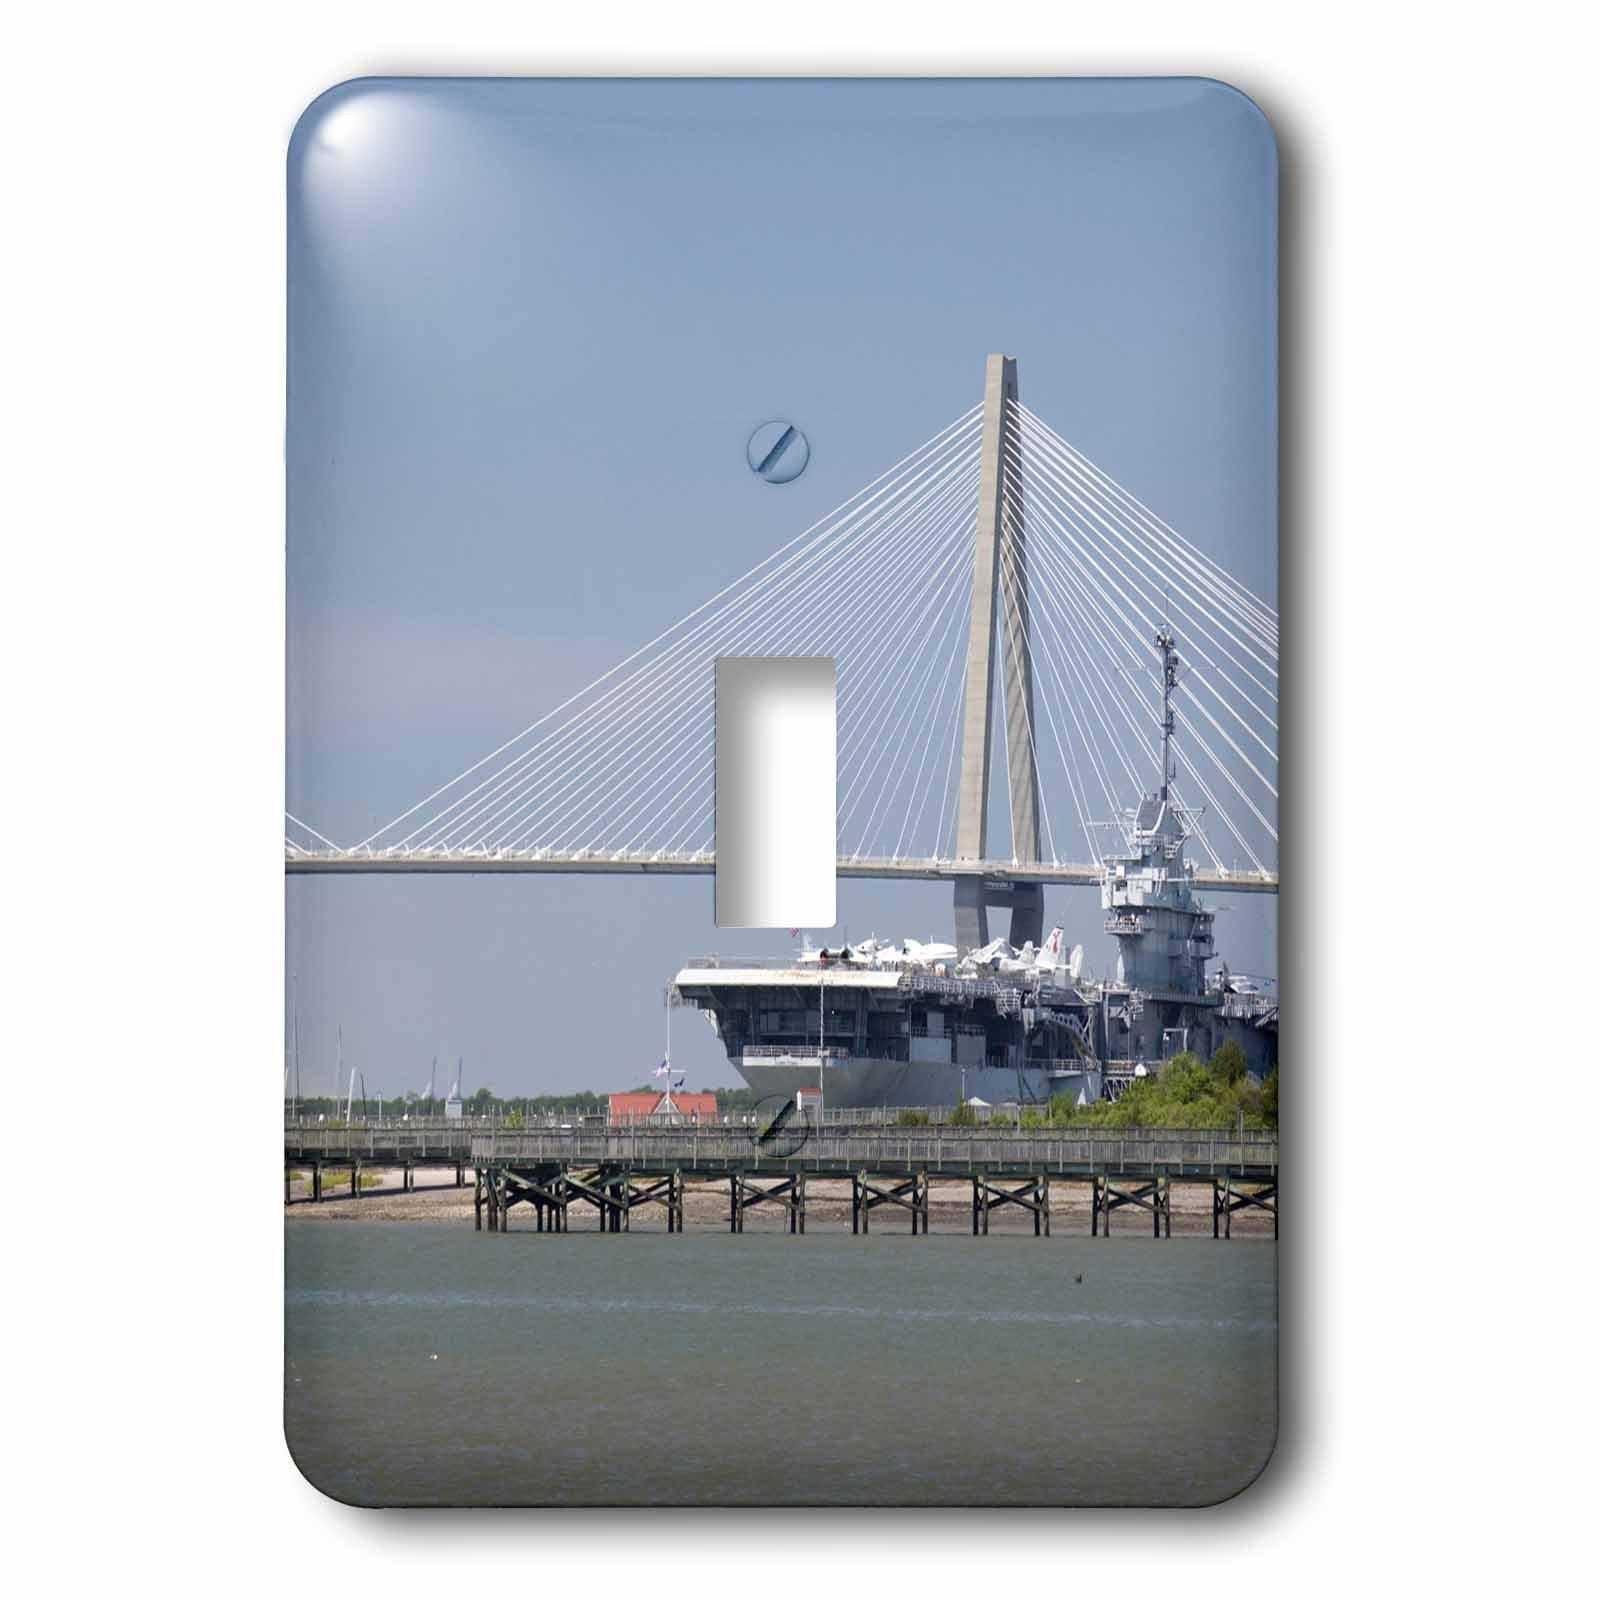 3dRose lsp_94257_1 Sc, Ravenel Bridge Yorktown Aircraft Carrier - Us41 Cmi0056 - Cindy Miller Hopkins - Single Toggle Switch